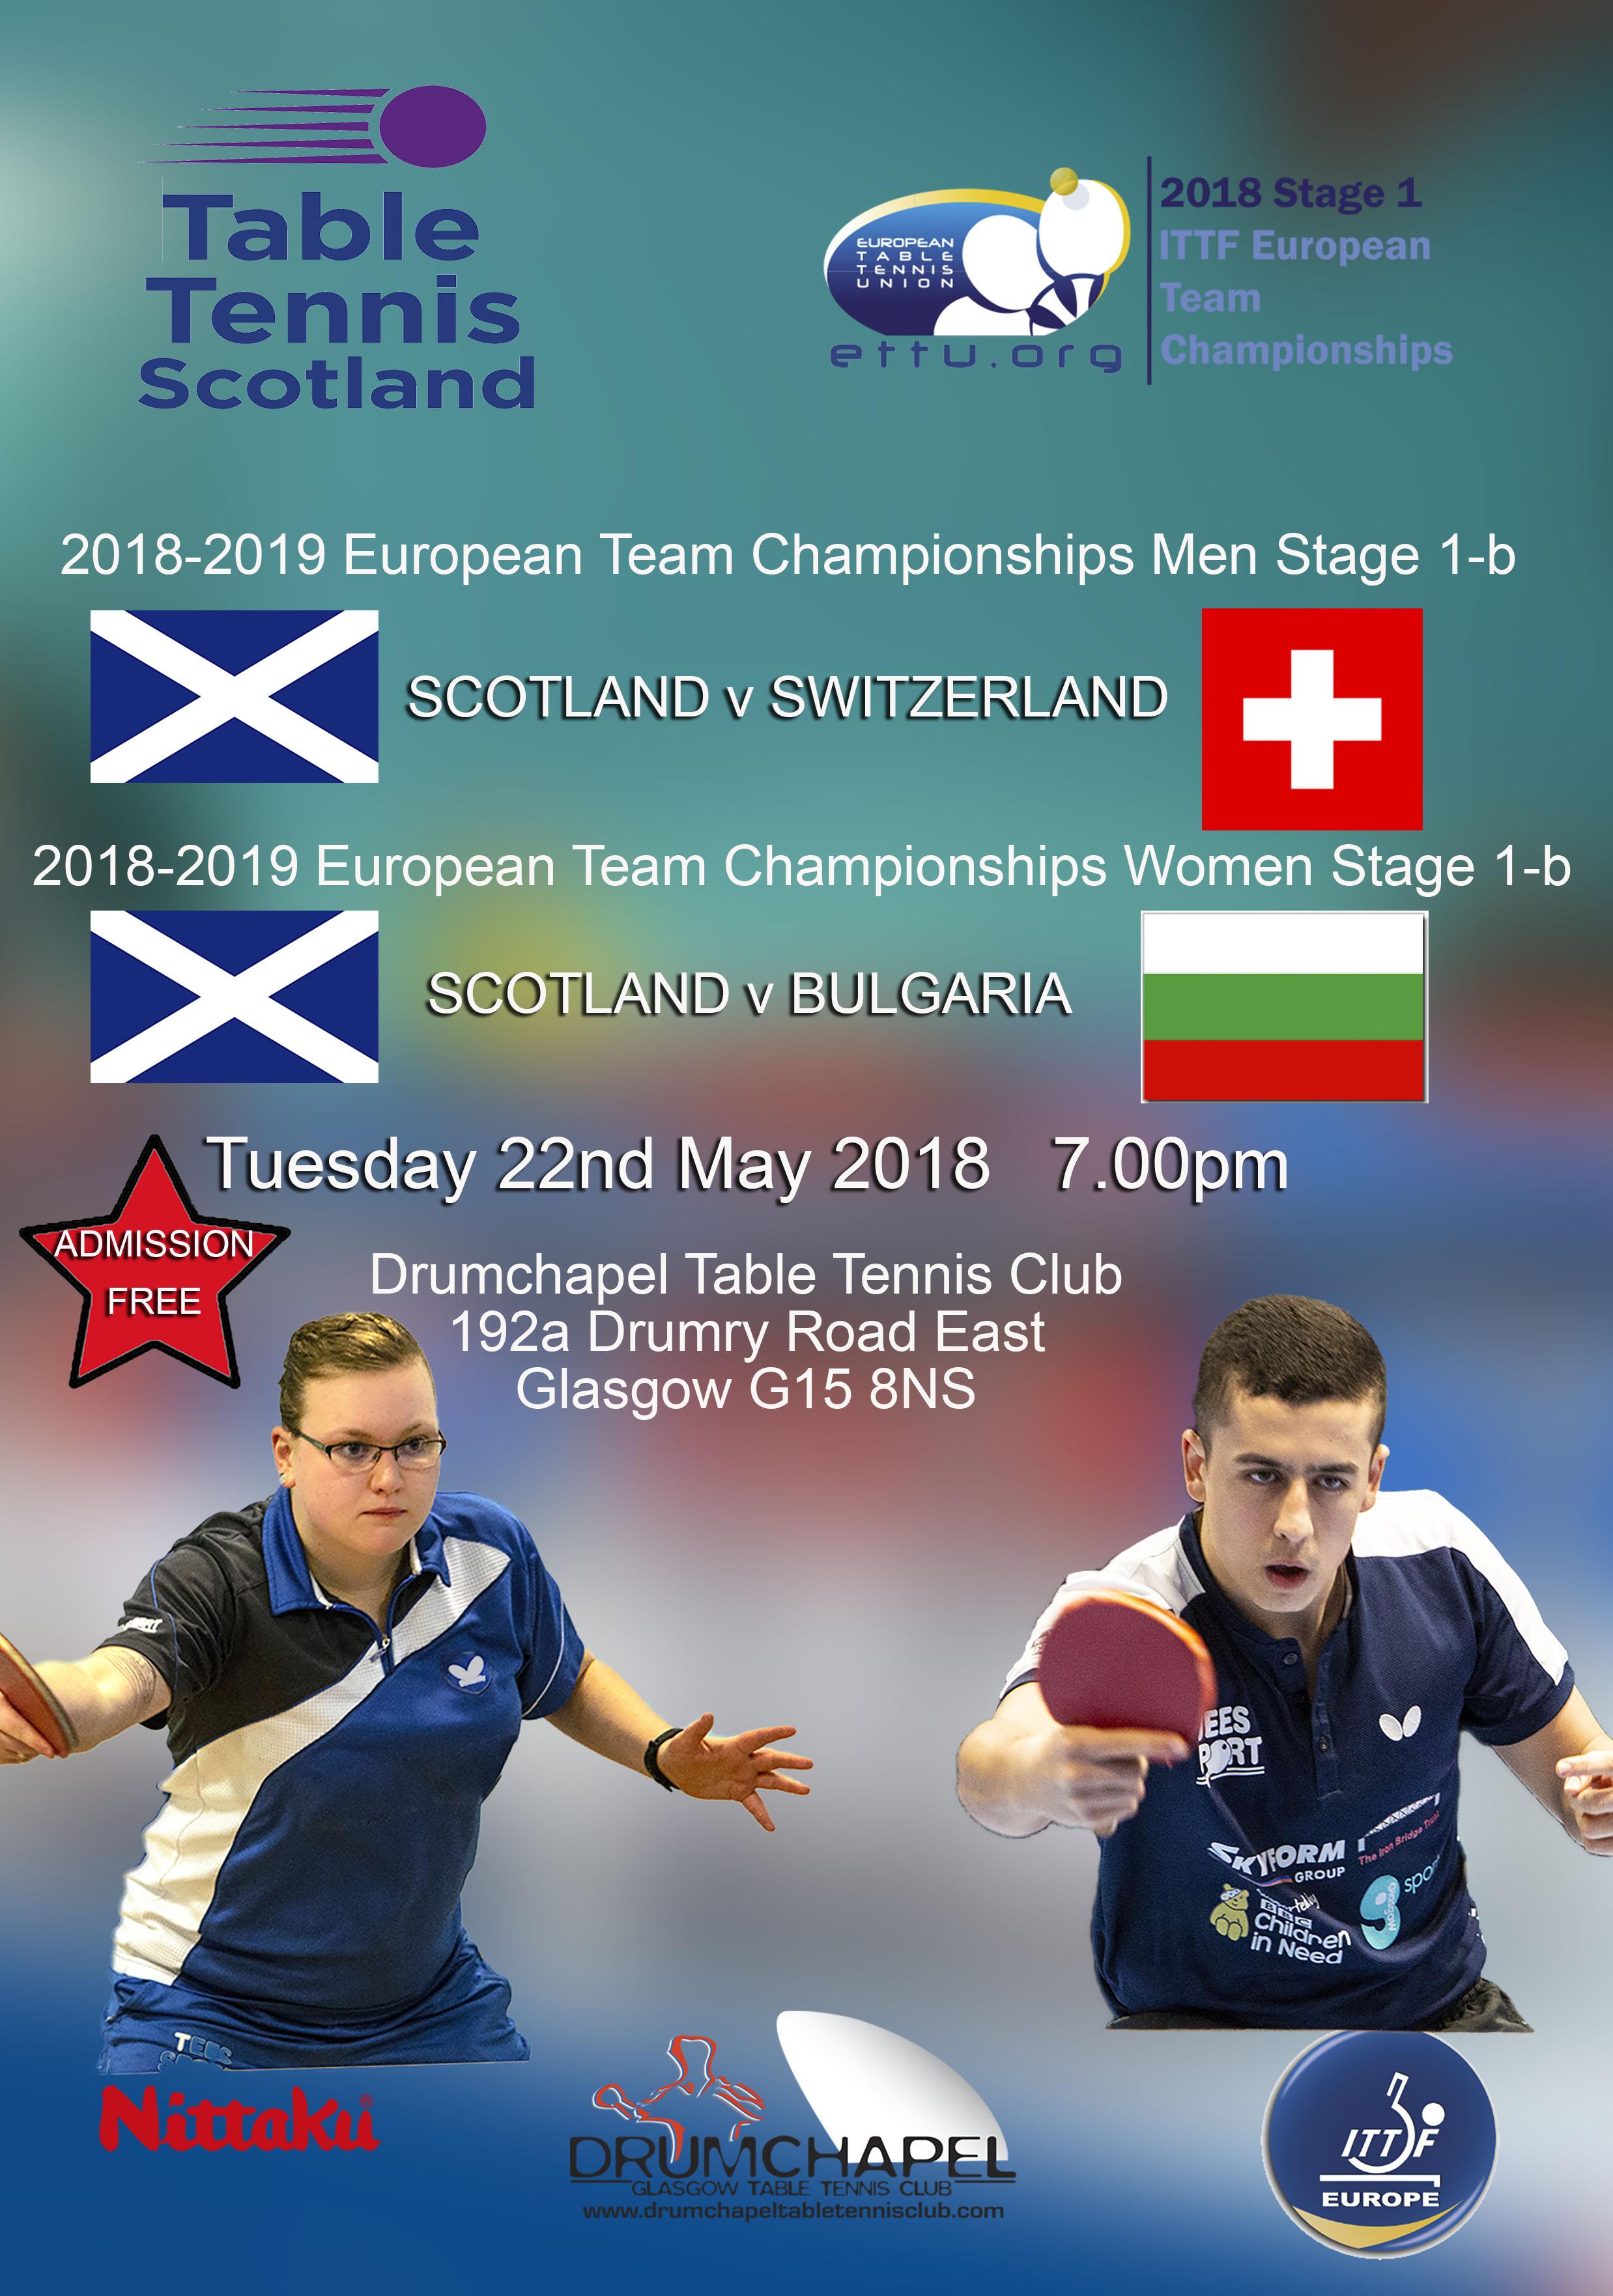 European Team Championships 2018/19